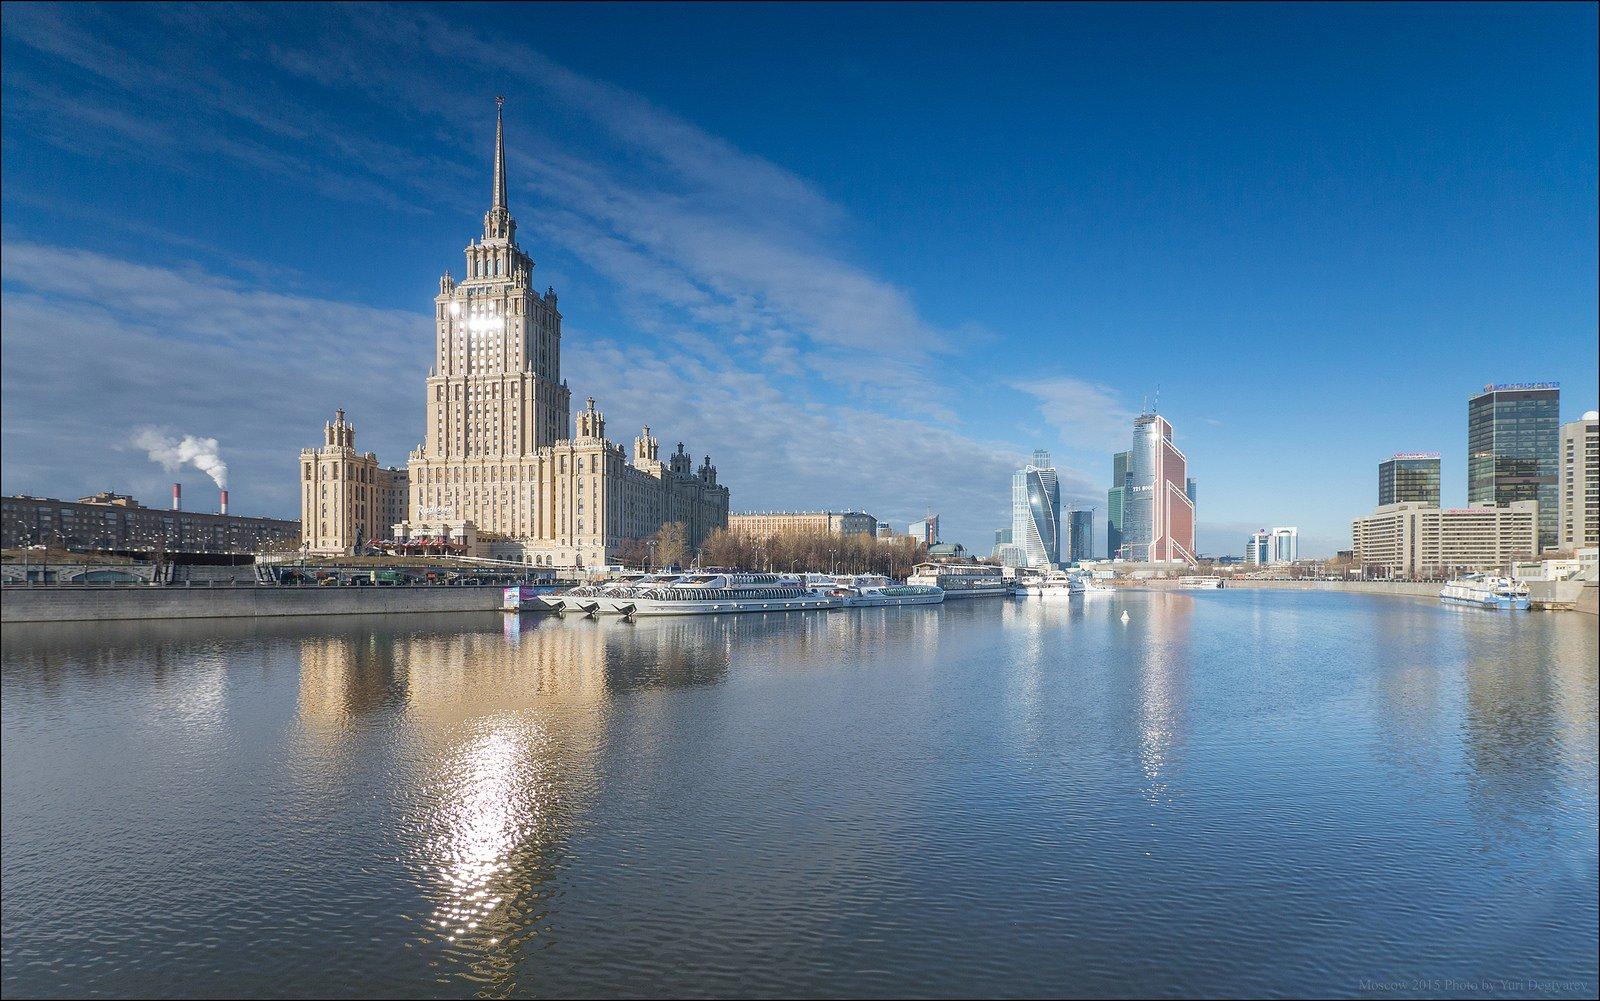 Radisson, Город, Гостиница, Москва, Облака, Река, Солнце, Столица, Украина, Утро, Юрий Дегтярёв